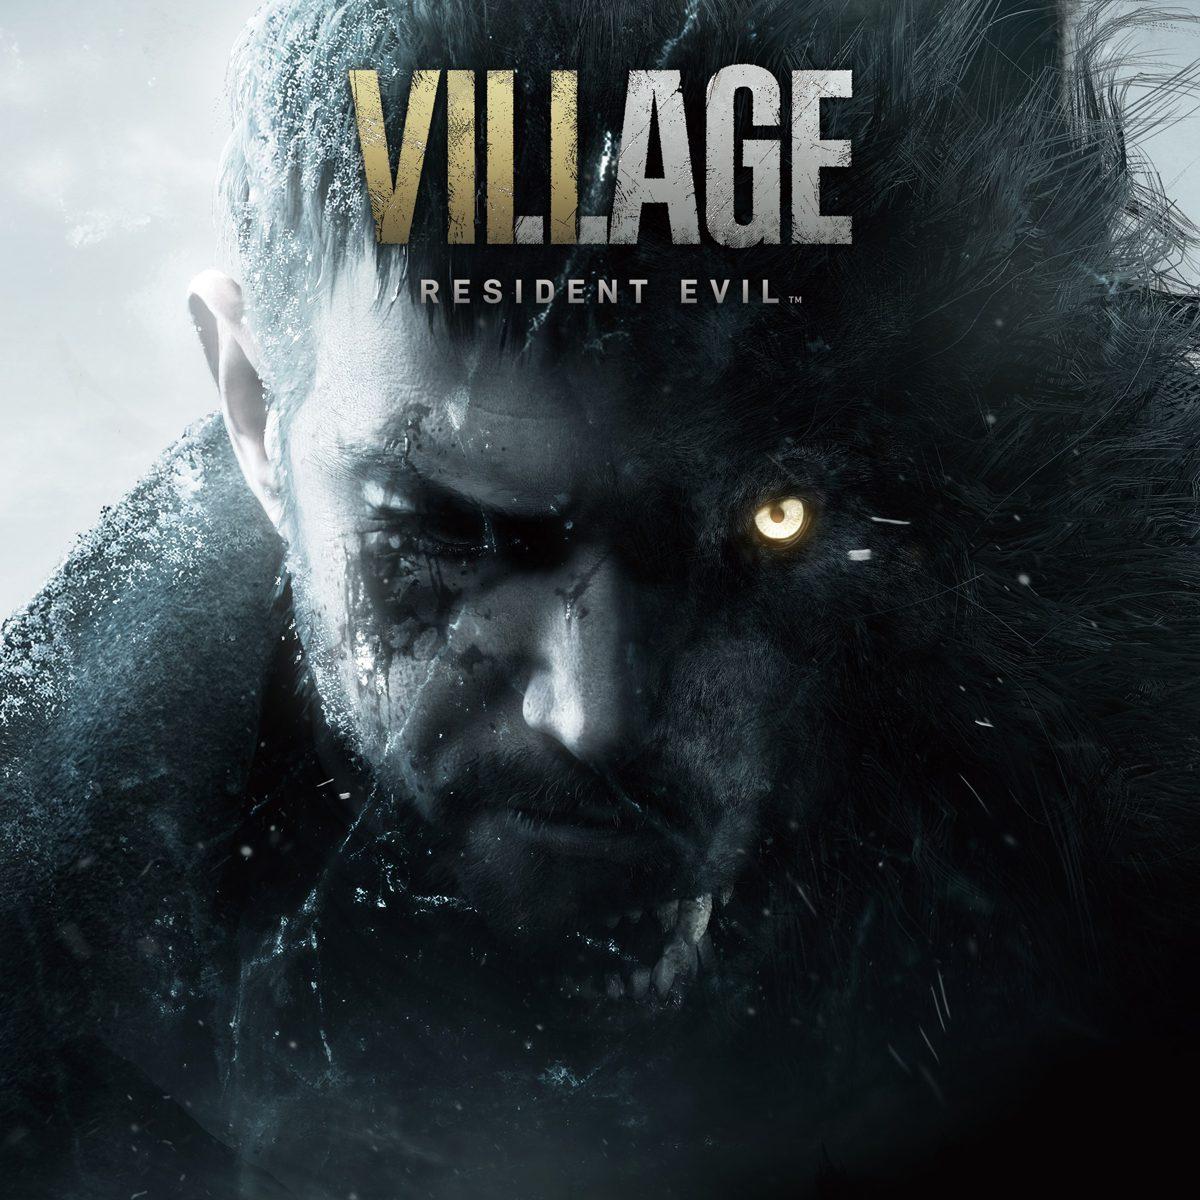 Resident Evil Village, ¿Conviene o no comprarlo? (Review)